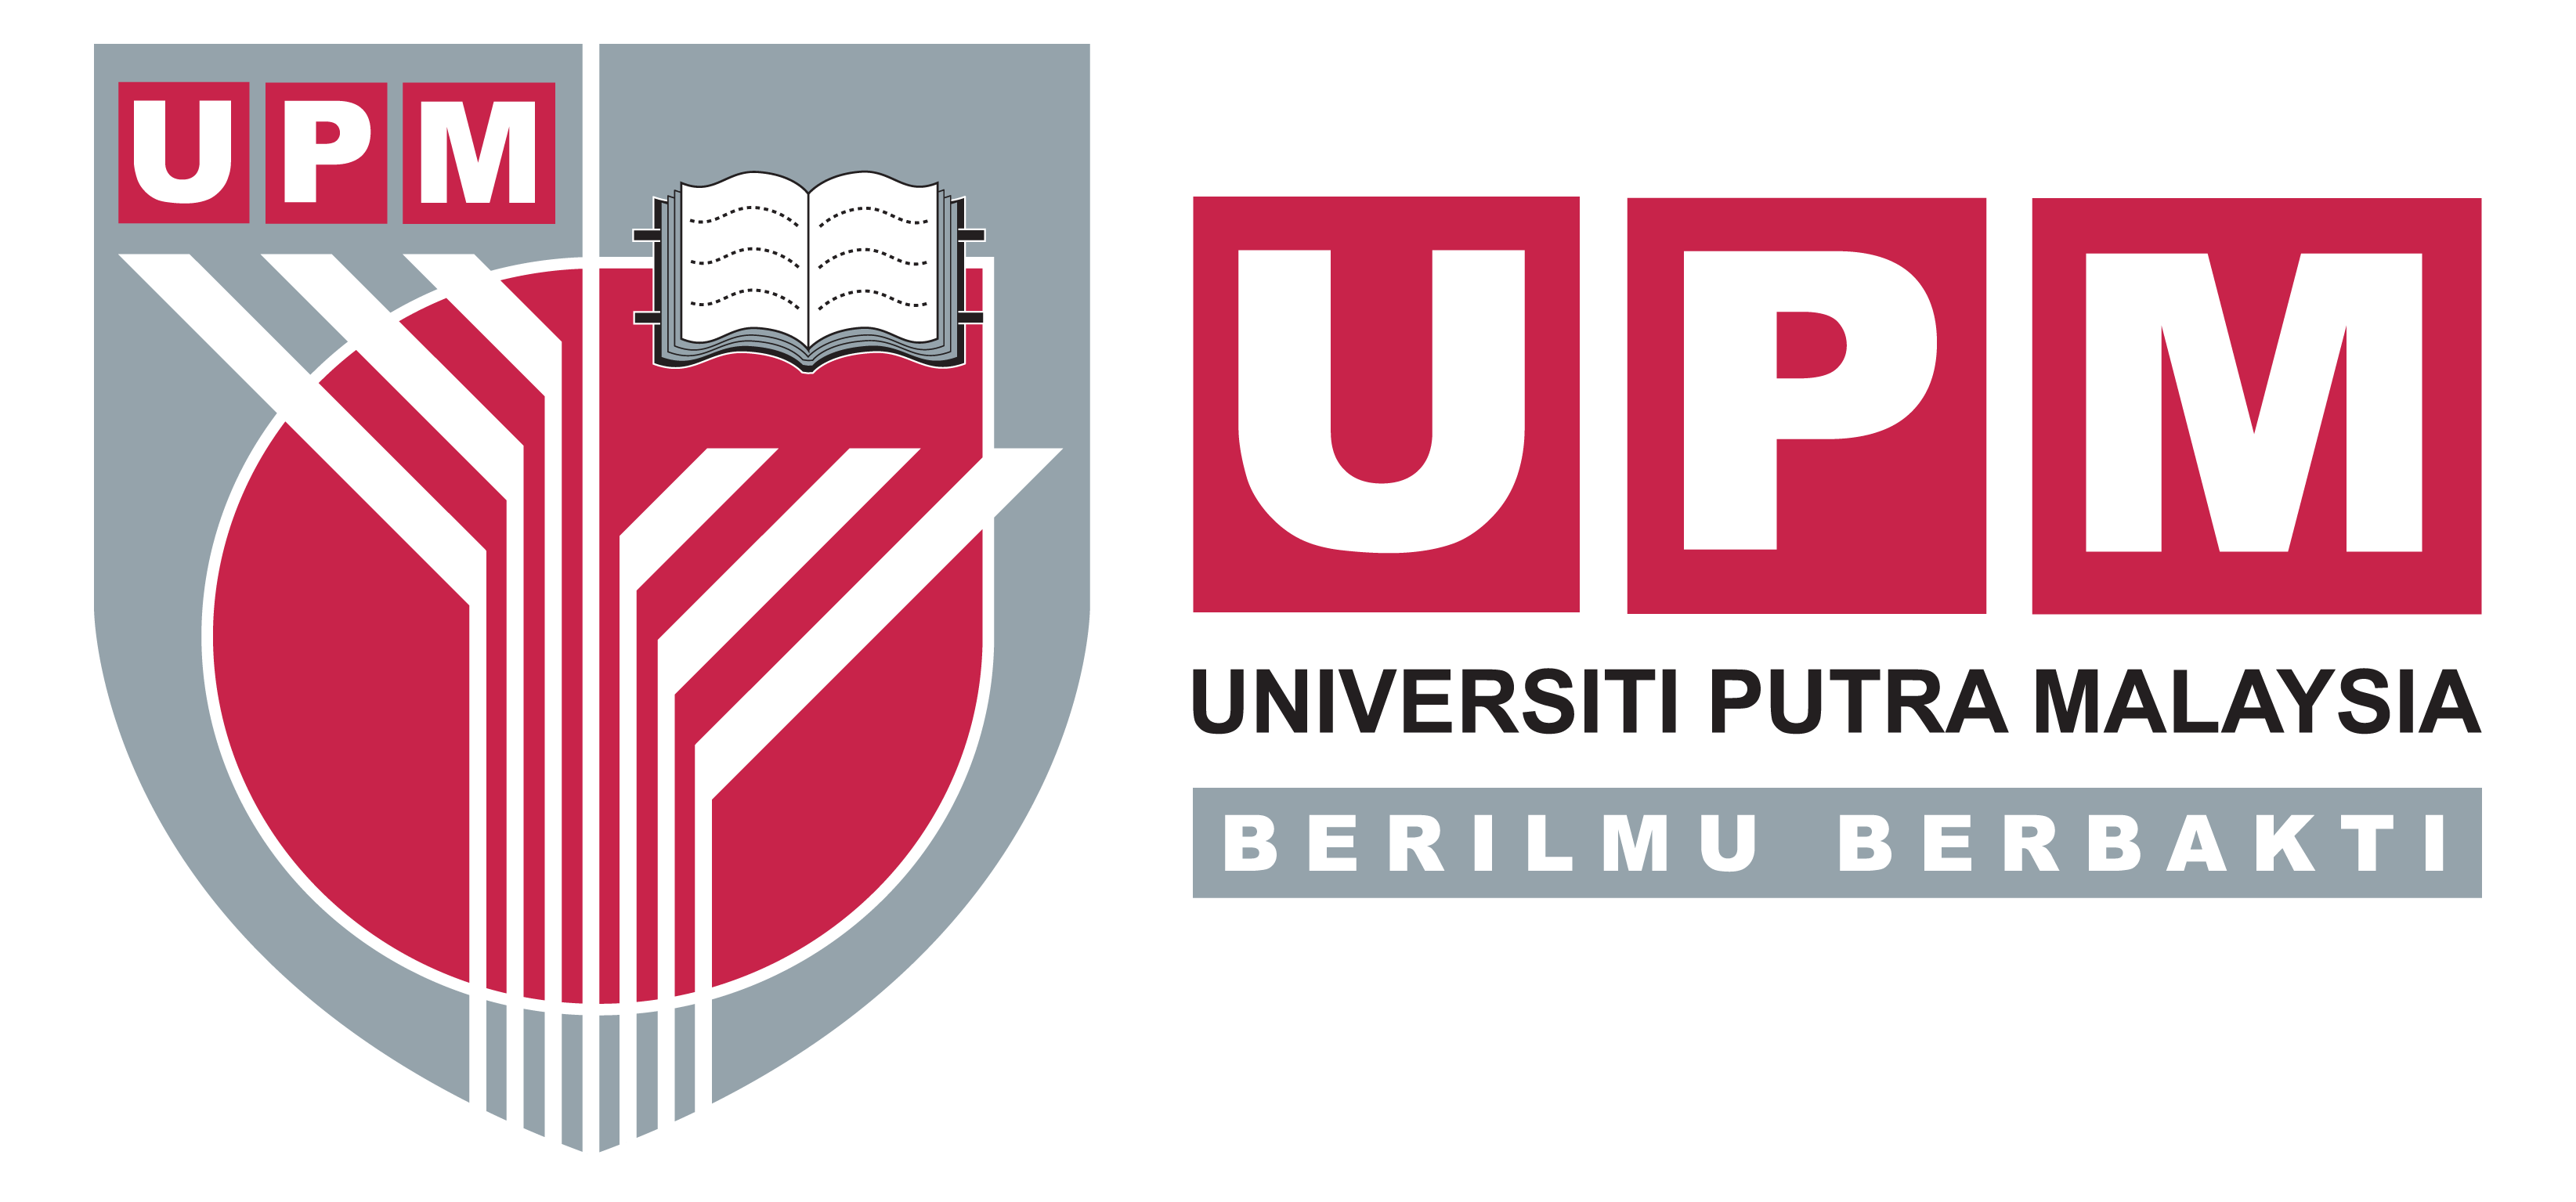 Universiti Putra Malaysia (UPM) logo